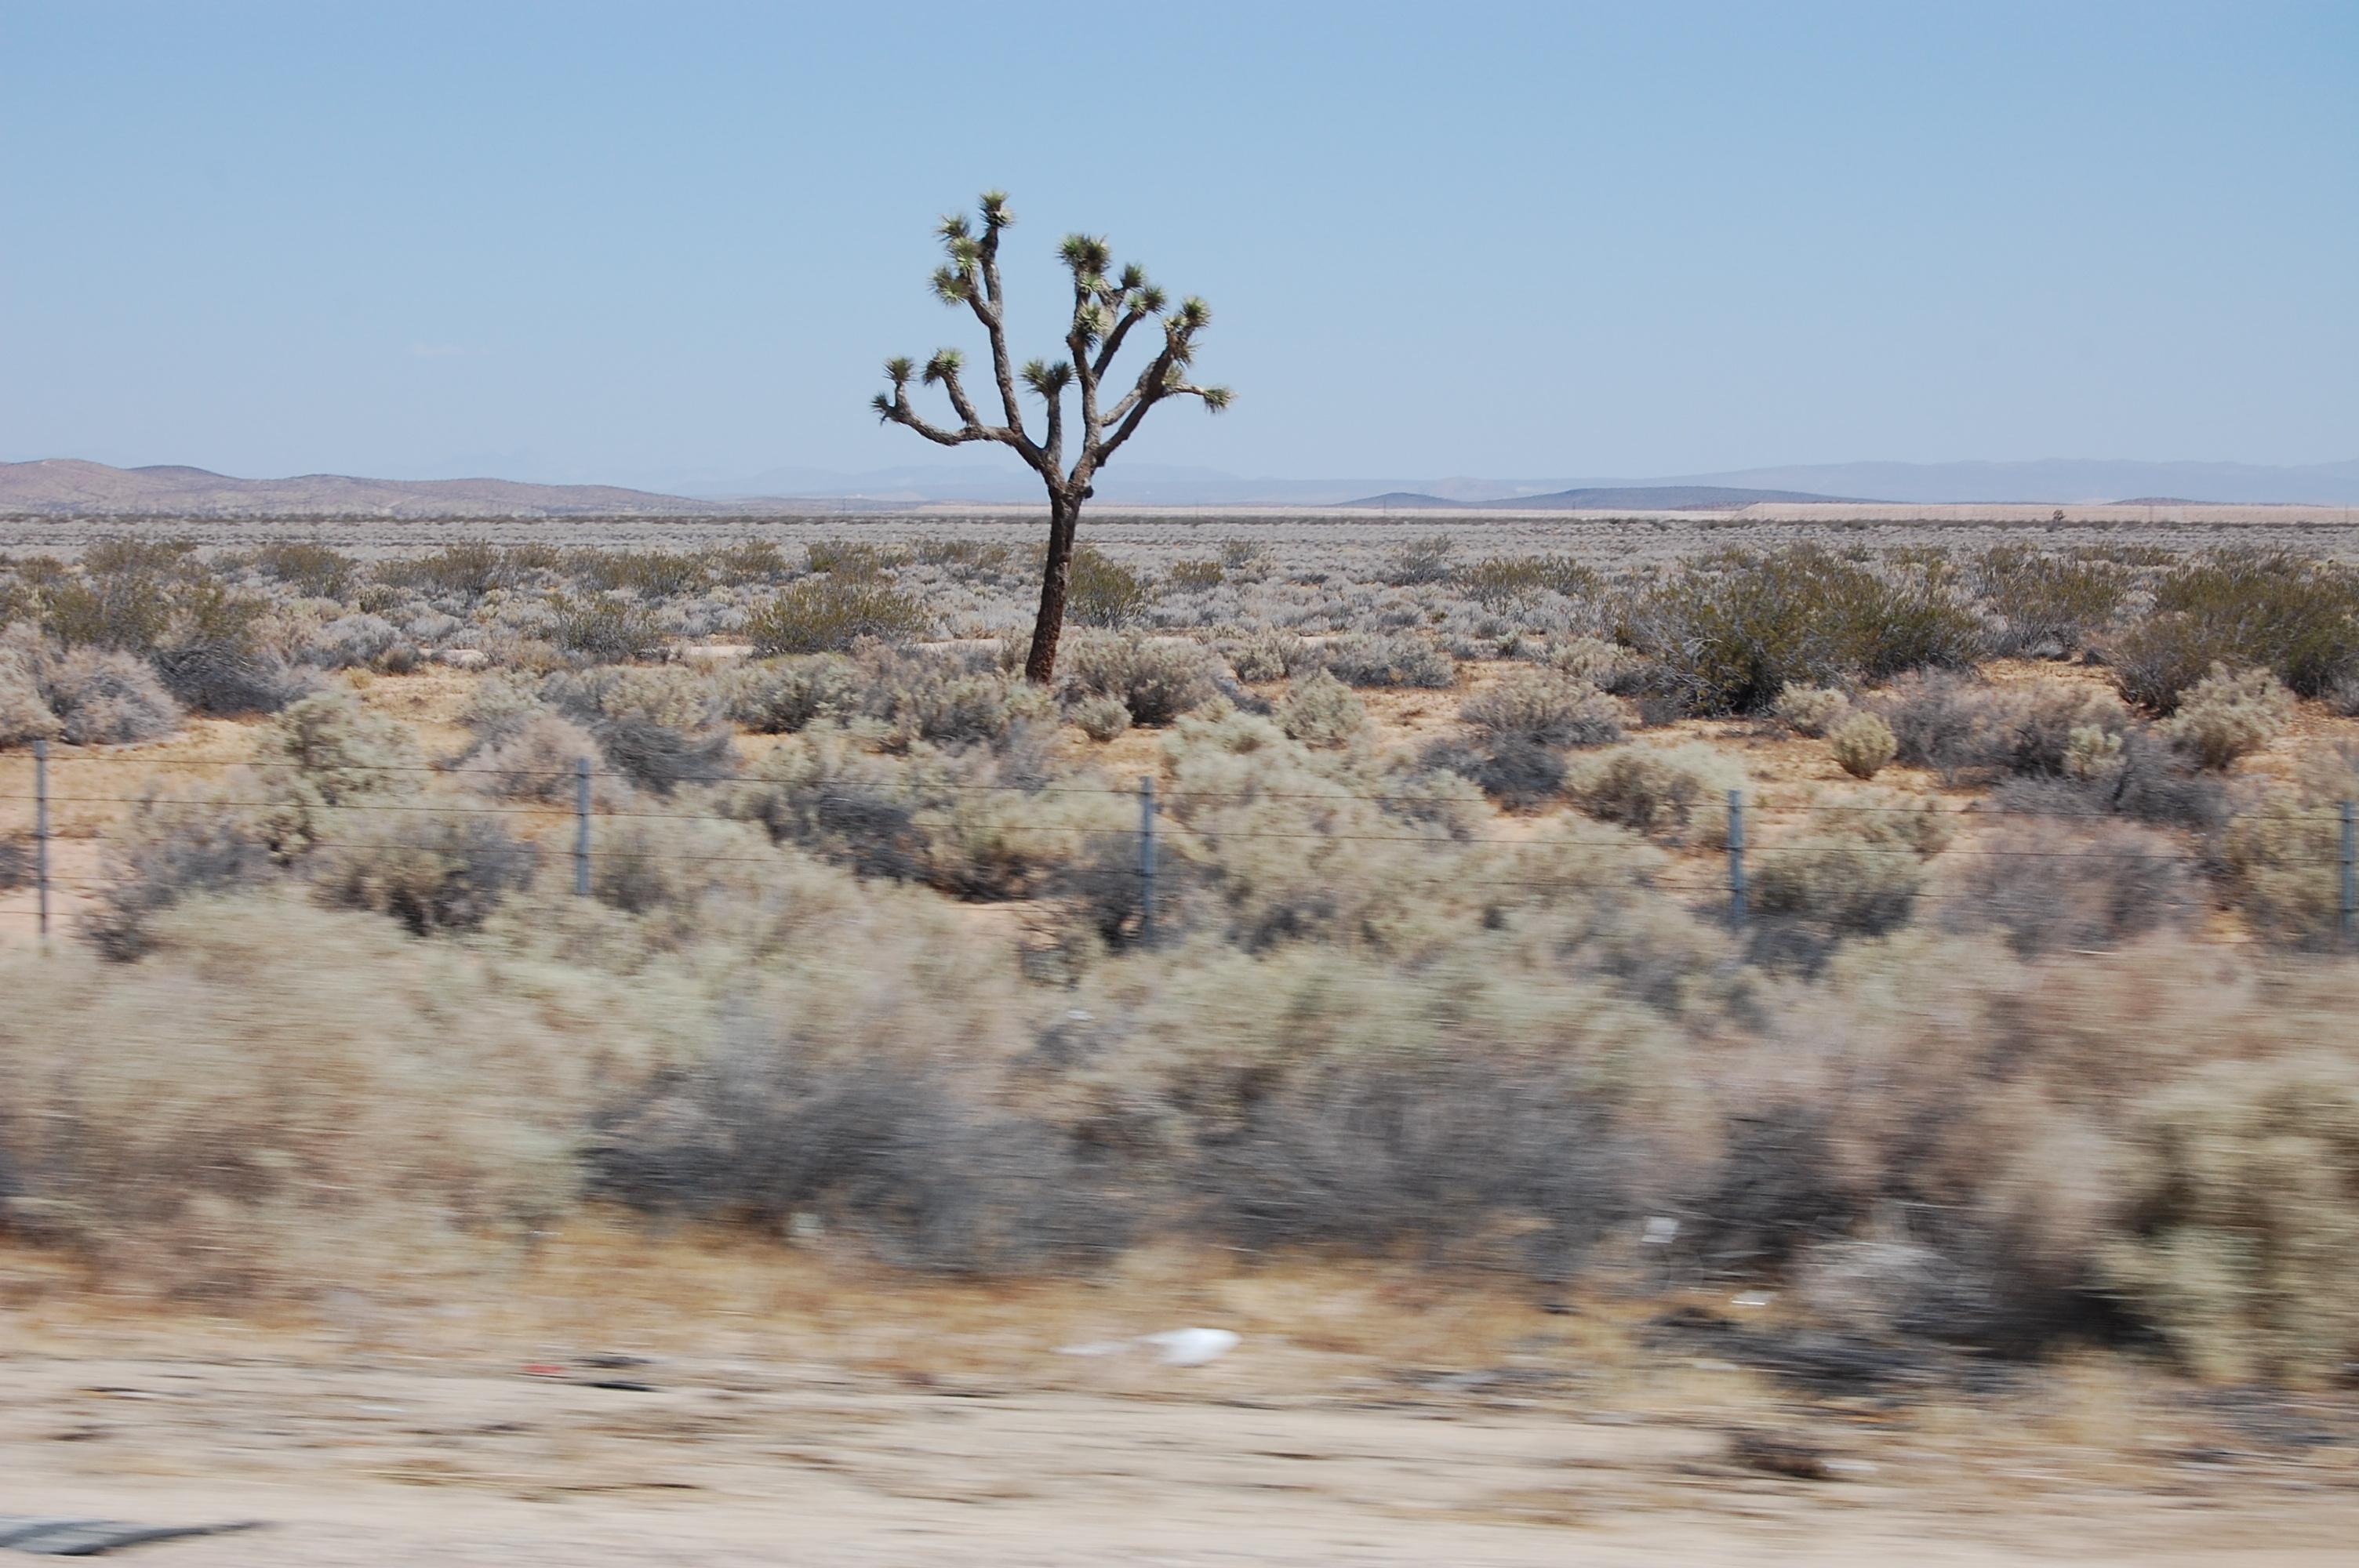 A Joshua tree in the Arizona desert